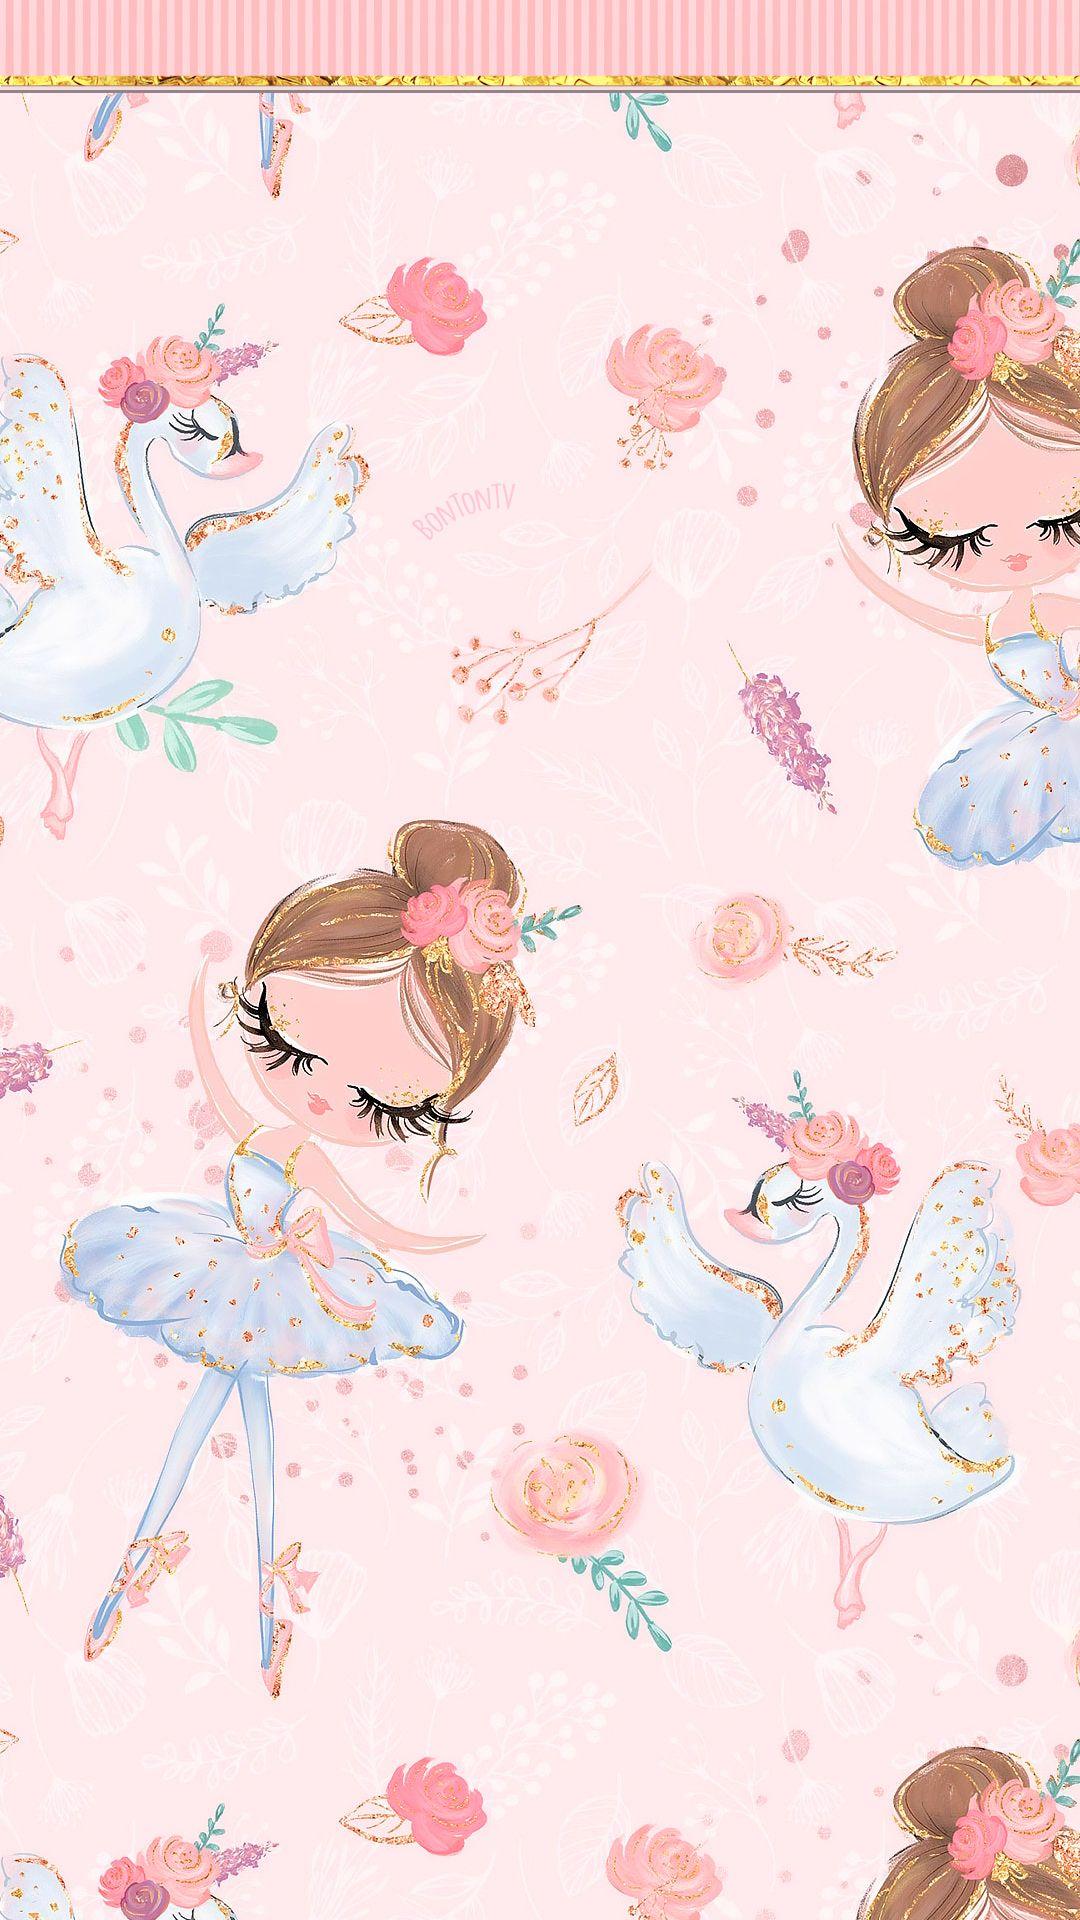 Phone Wallpapers Hd Cute Pink Swan Lake Ballerina By Bonton Tv Free Backgrounds 1080x1920 Wallpapers Wallpaper Pozadine B Seni Kertas Dinding Ilustrasi